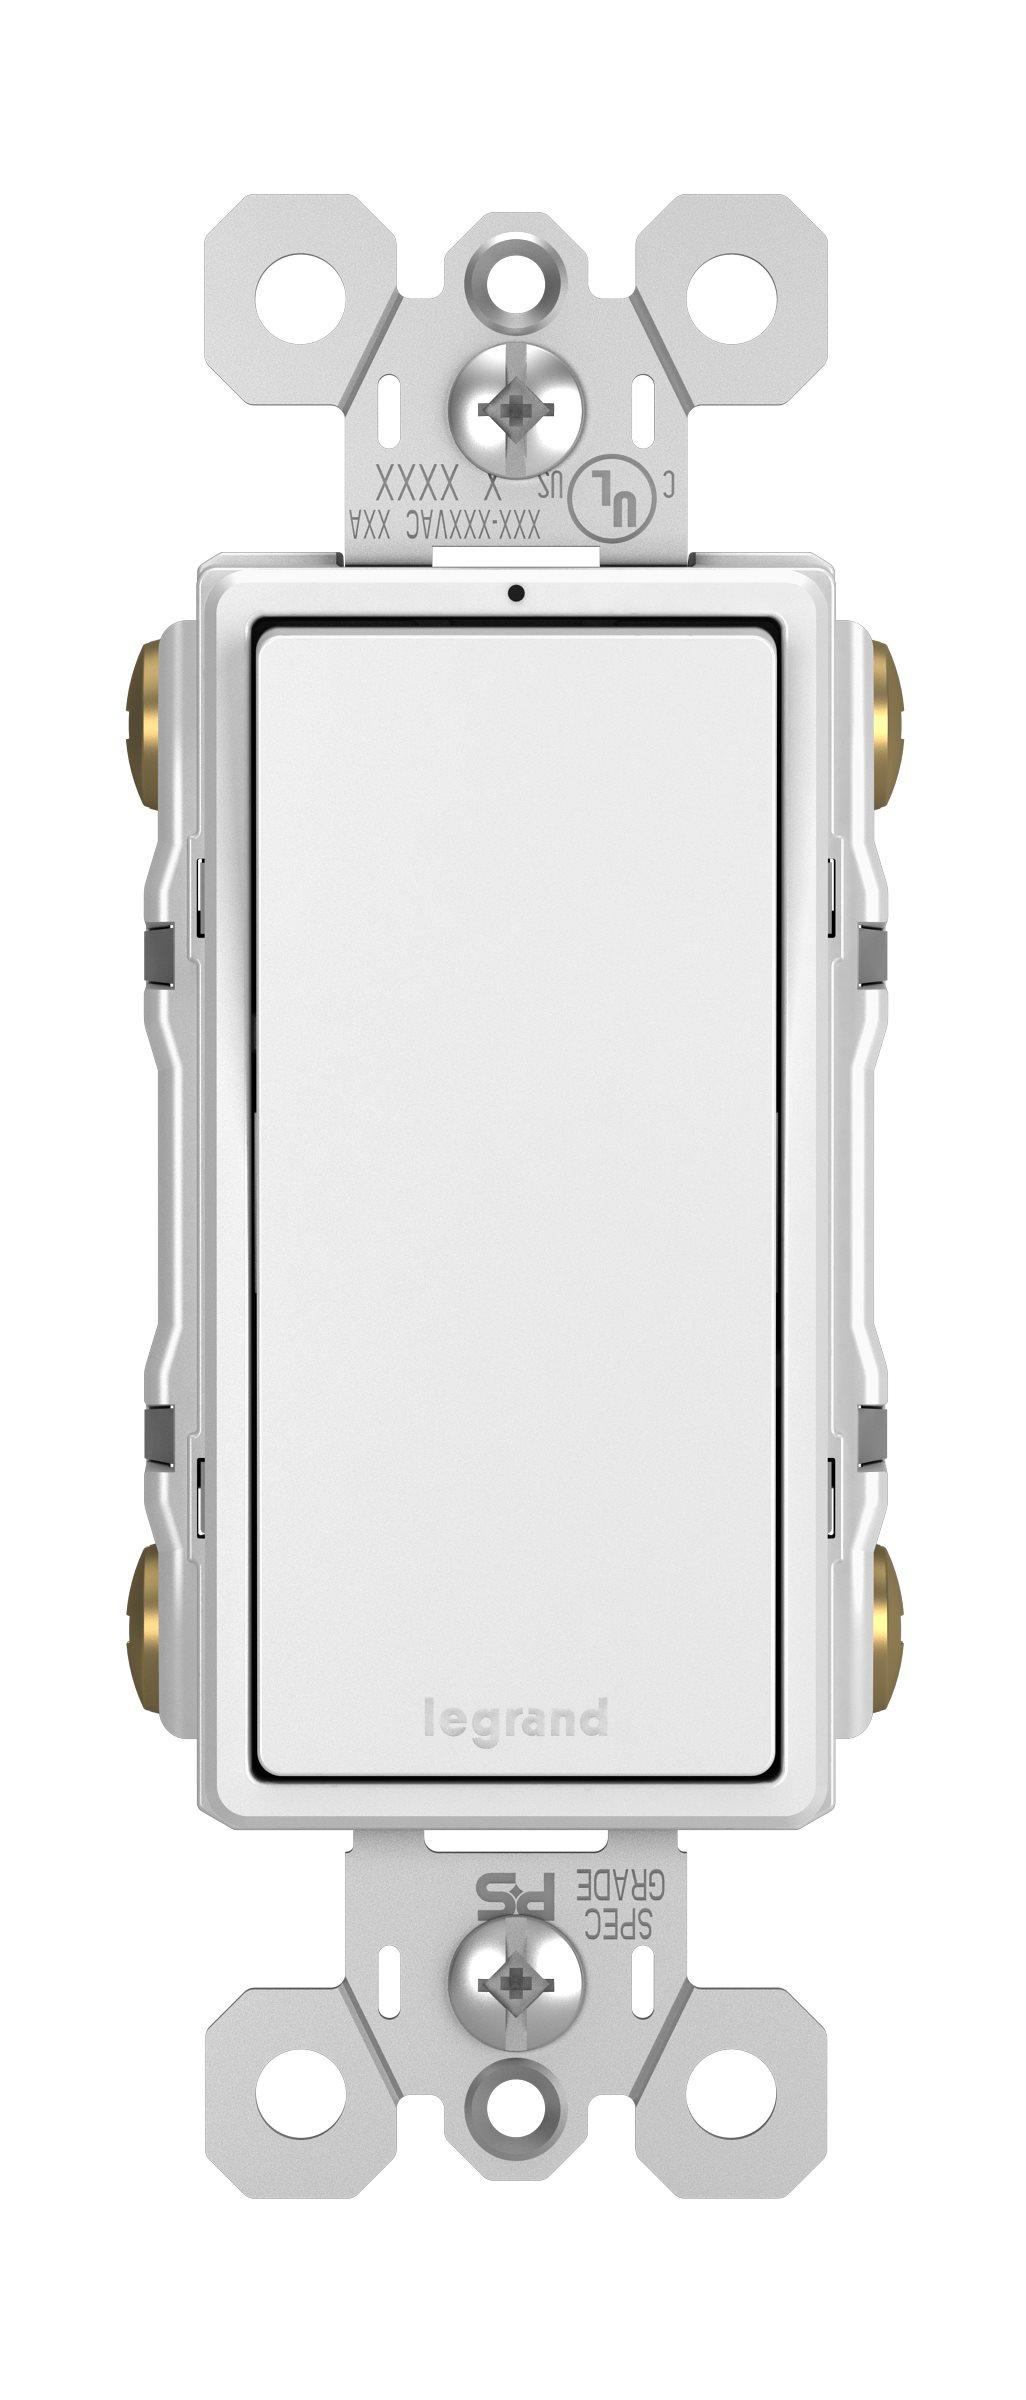 Legrand Radiant 4 Way Decorator Switch Lighted White 2